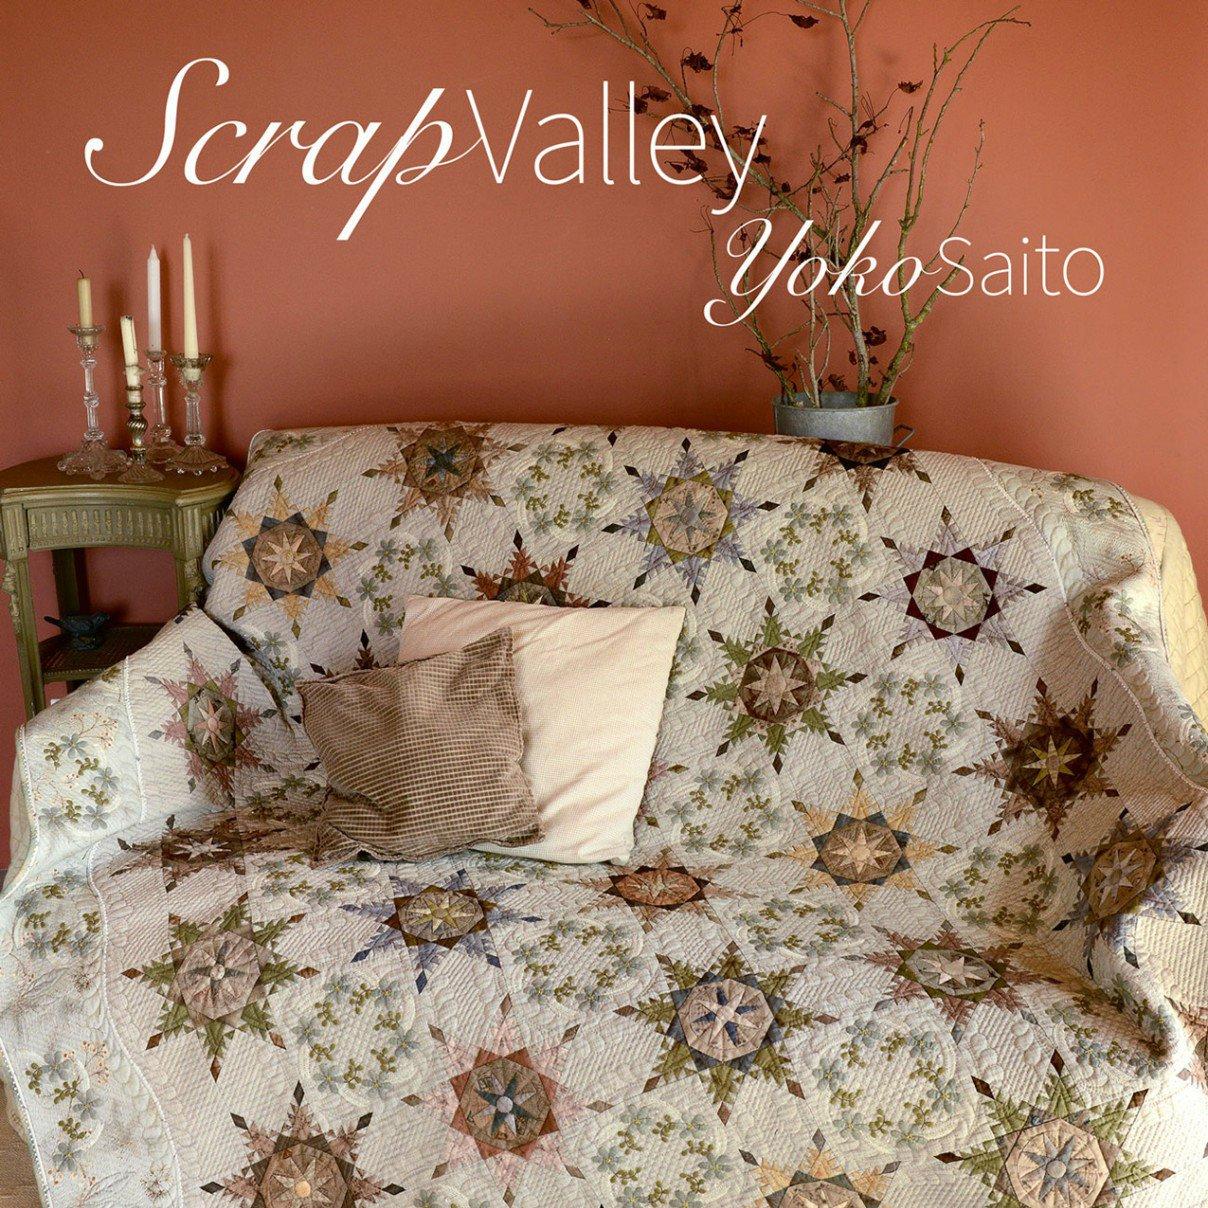 Yoko Saito Book:  Scrap Valley - Extraordinarily Beautiful Quilts